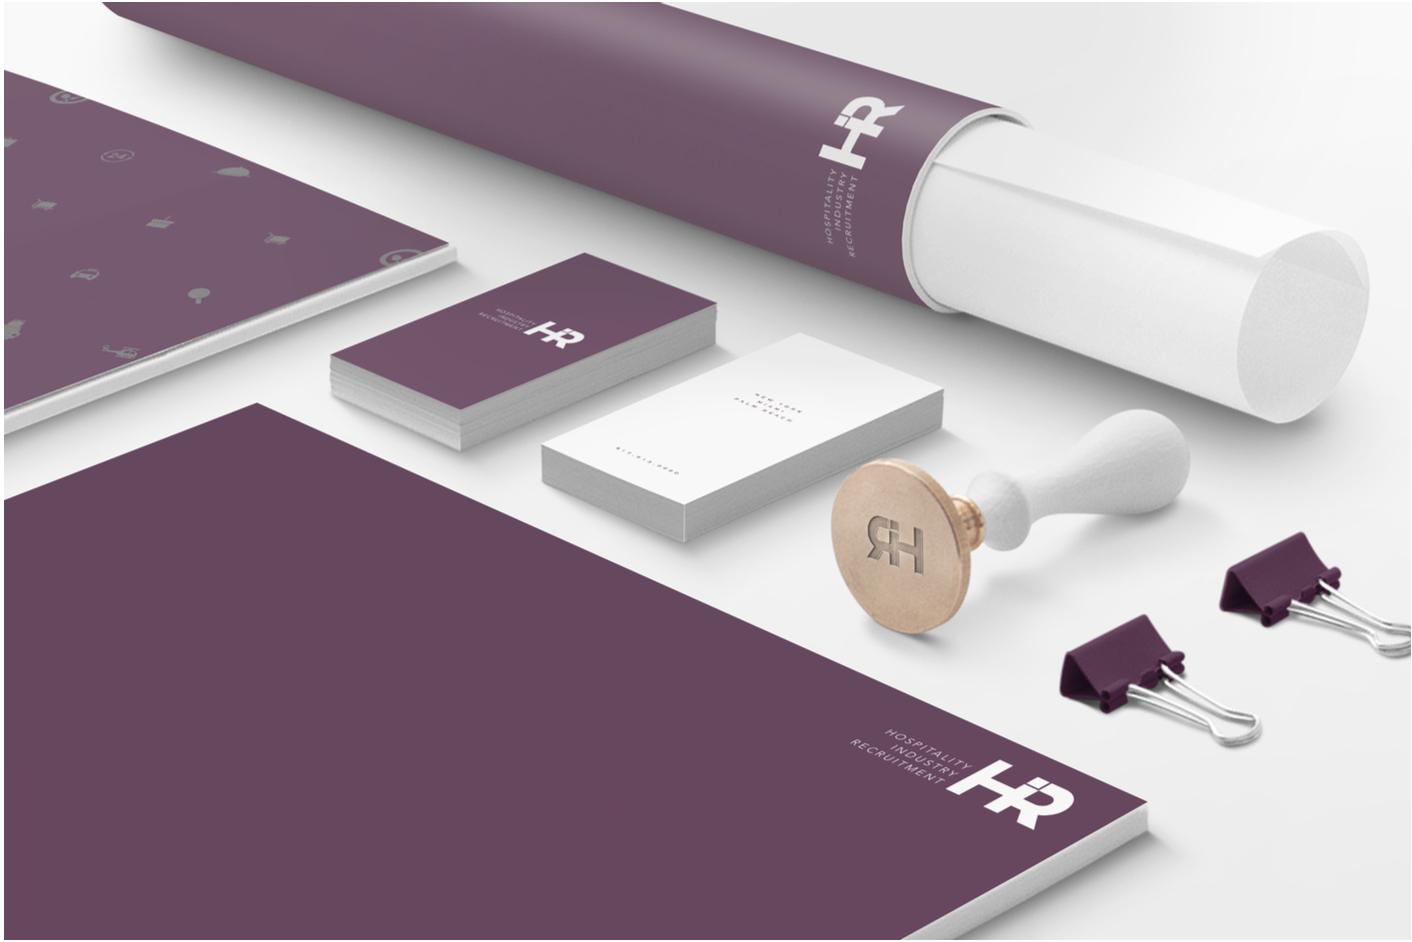 HIR Corproate Branding Pack